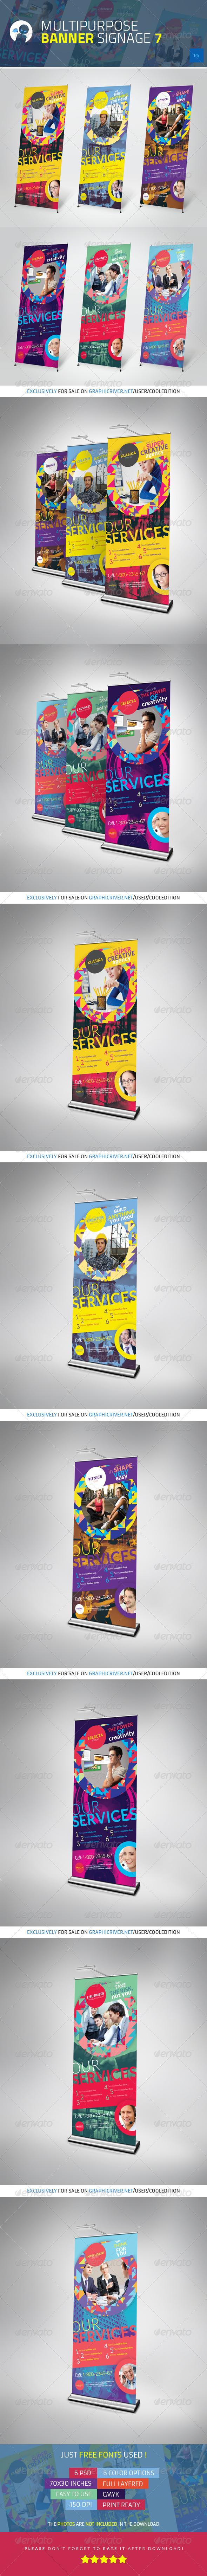 Multipurpose Banner Signage 7 - Signage Print Templates